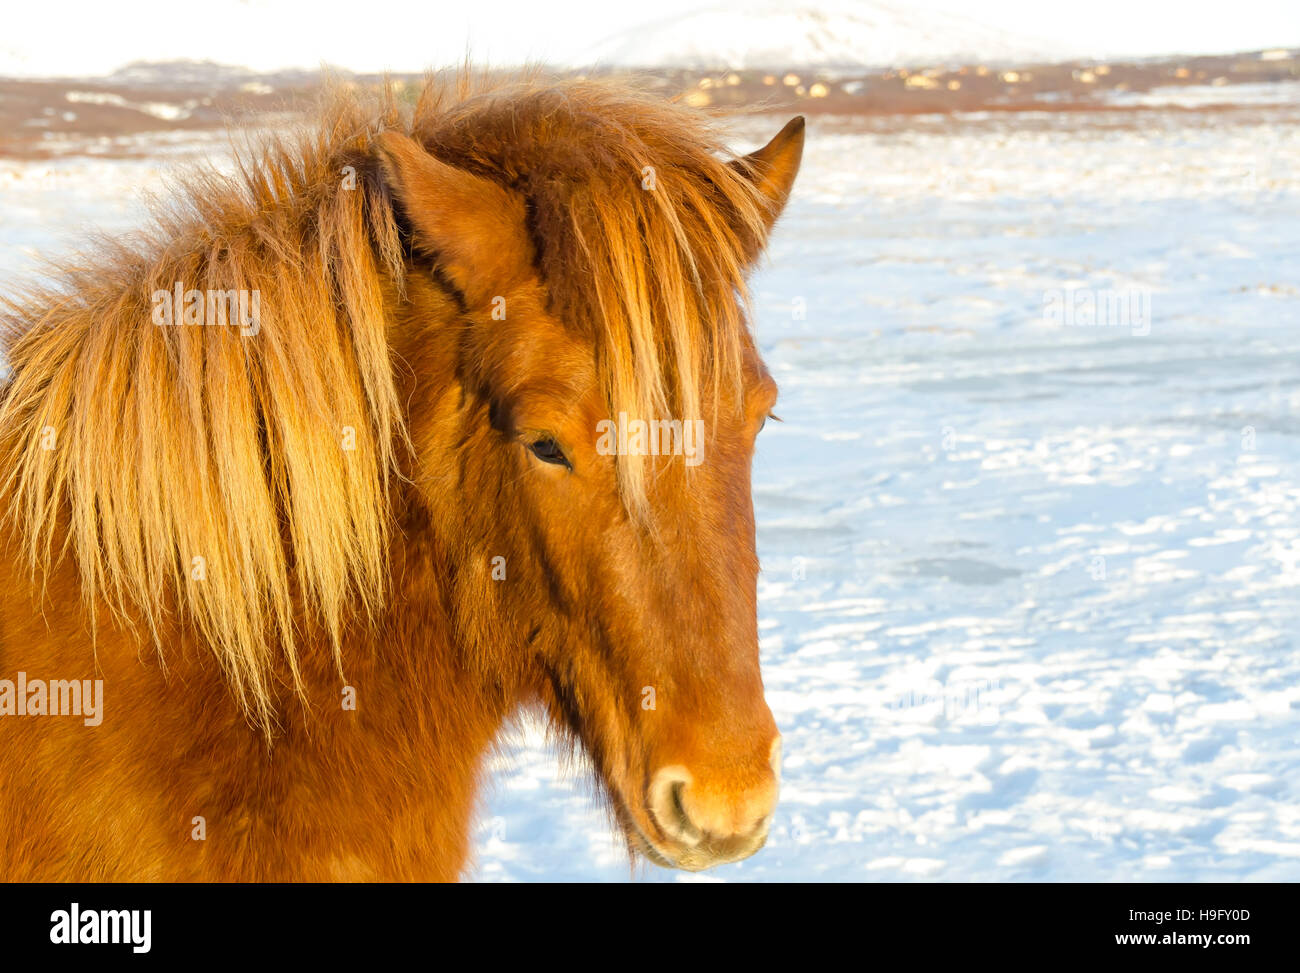 Icelandic horse in snowy pasture - Stock Image